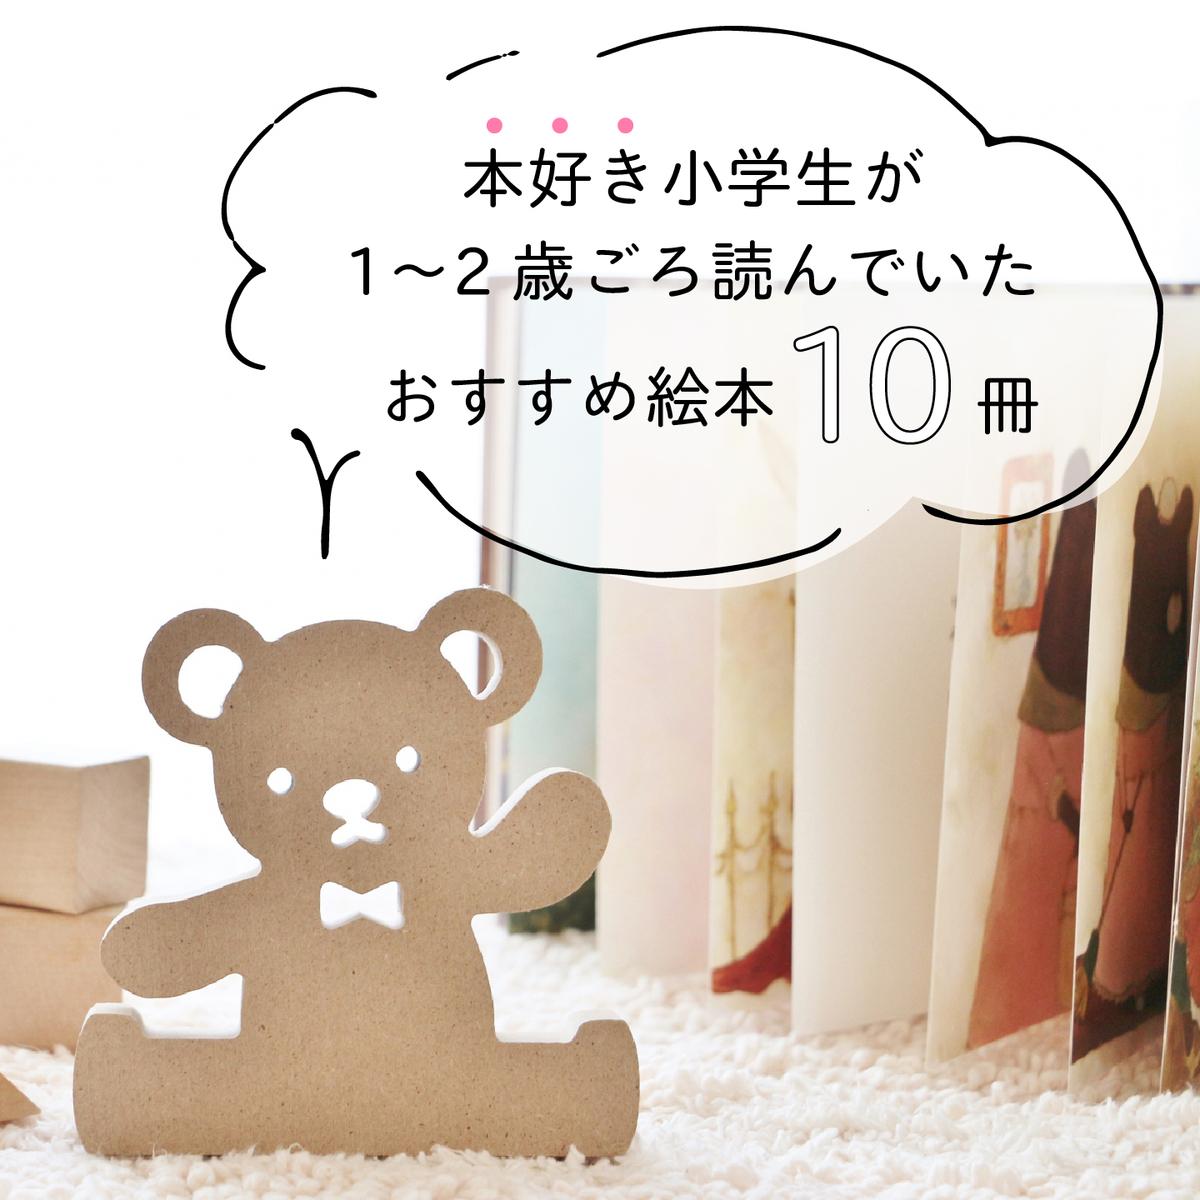 f:id:kotoritamago:20201225053357j:plain